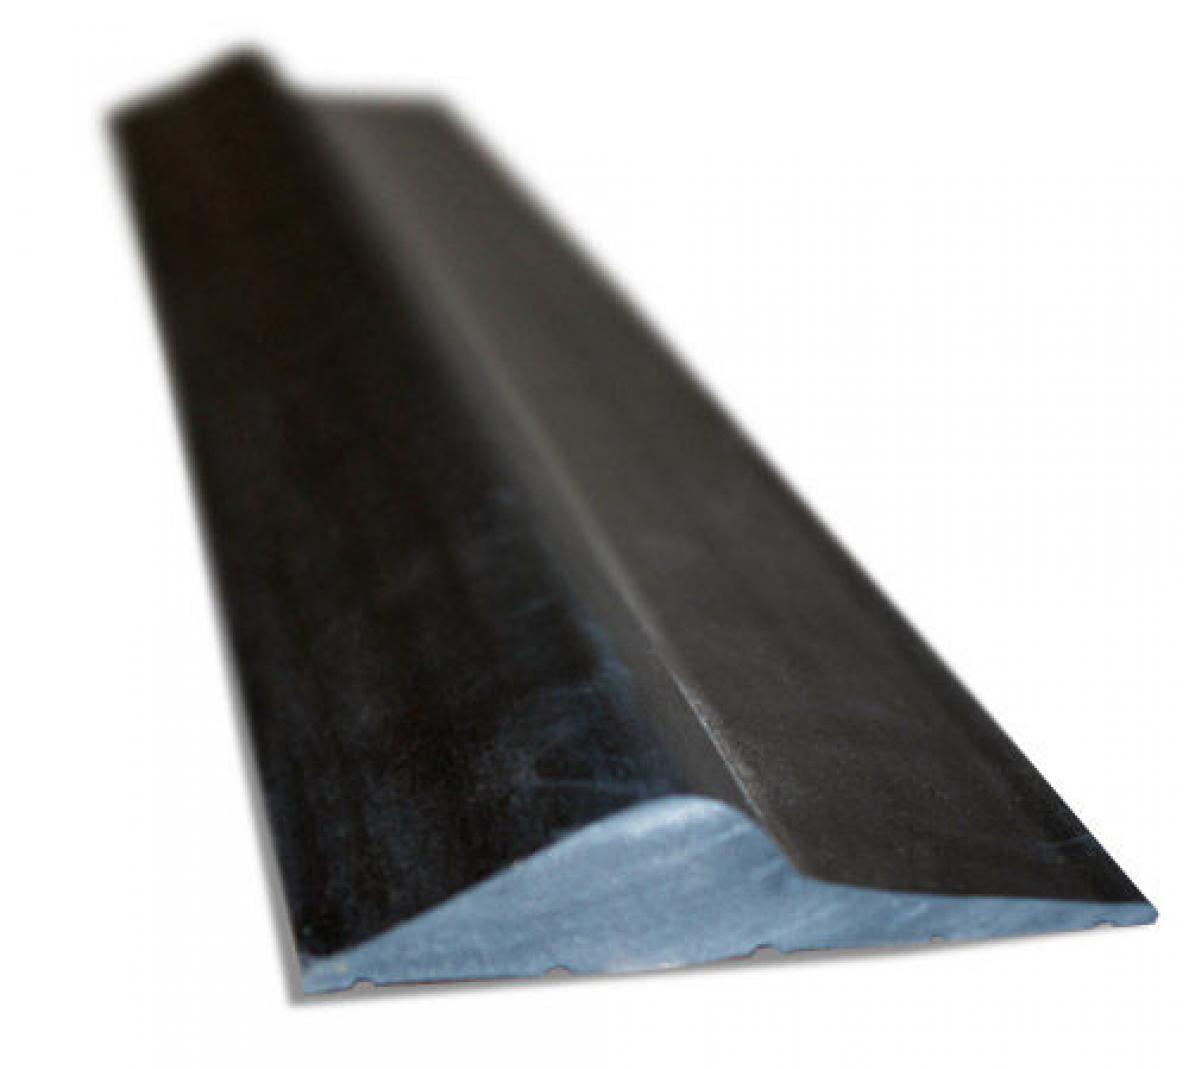 15mm Black Rubber Threshold Seal Ja Seals